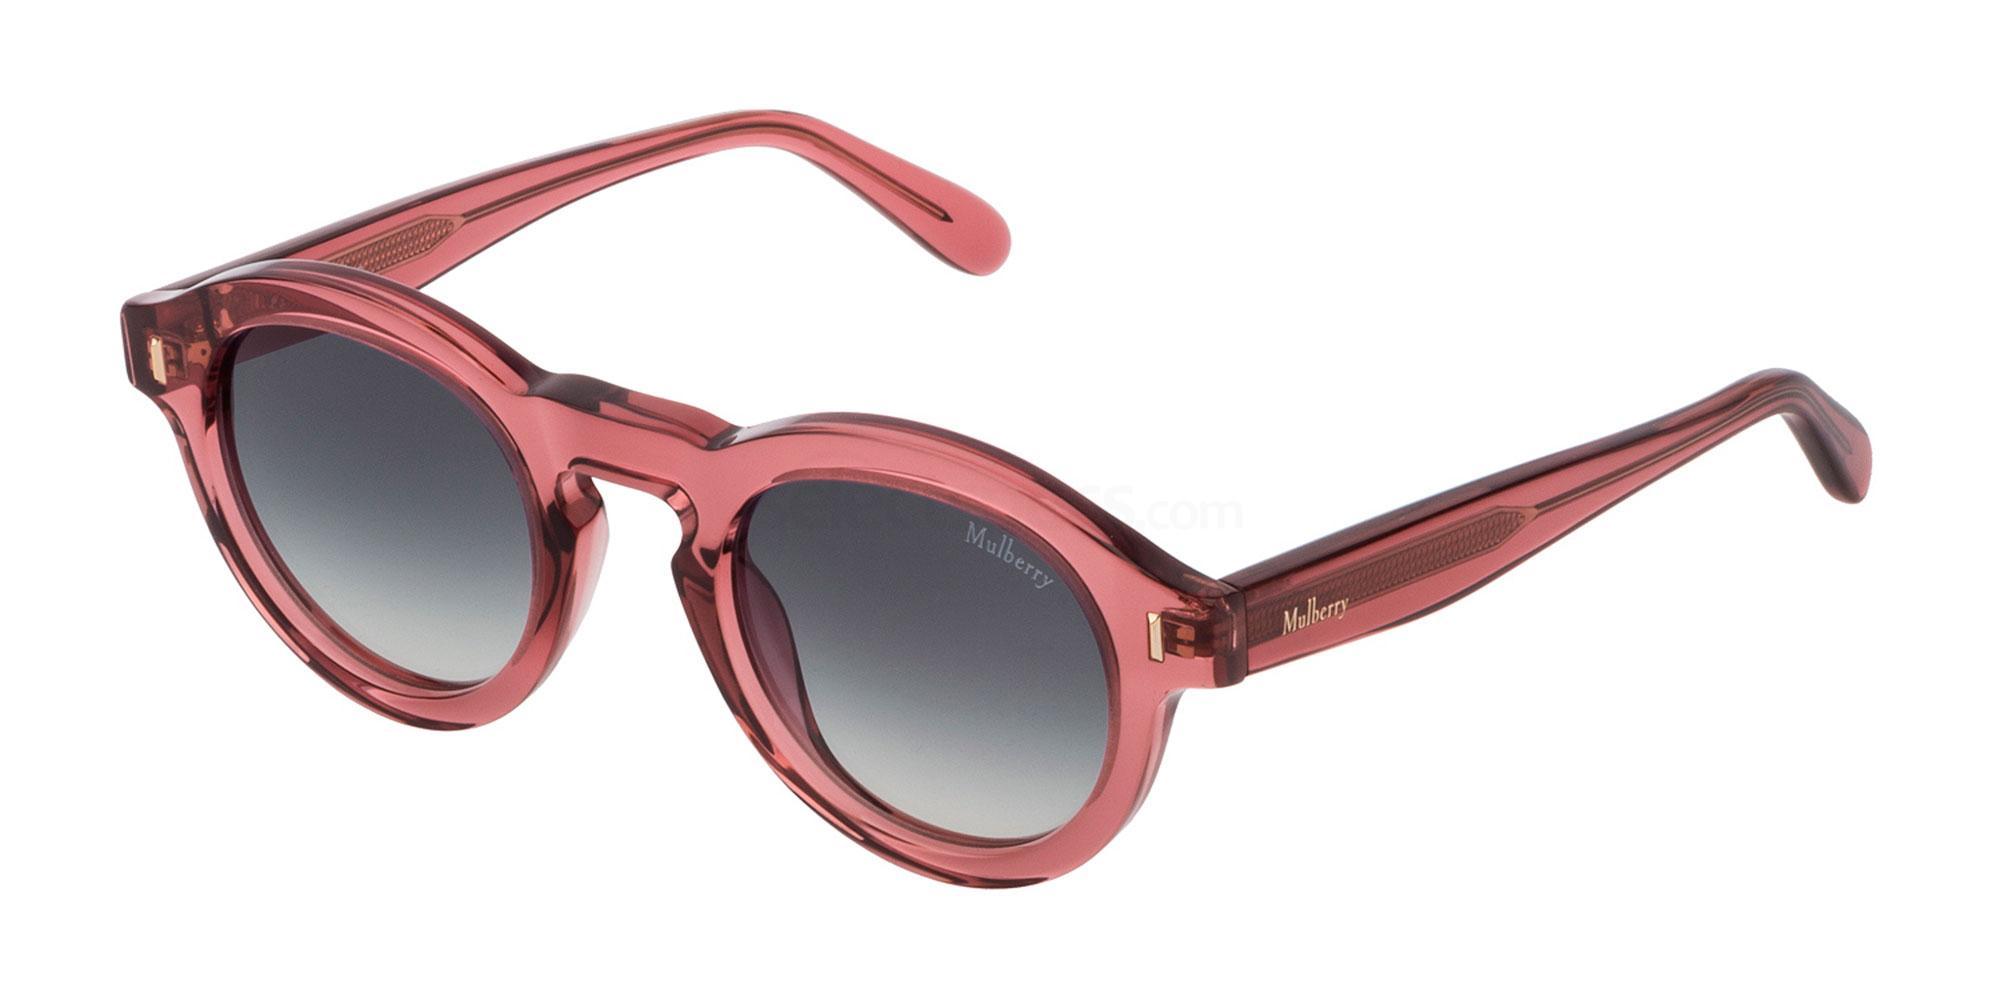 04GB SML004 Sunglasses, Mulberry